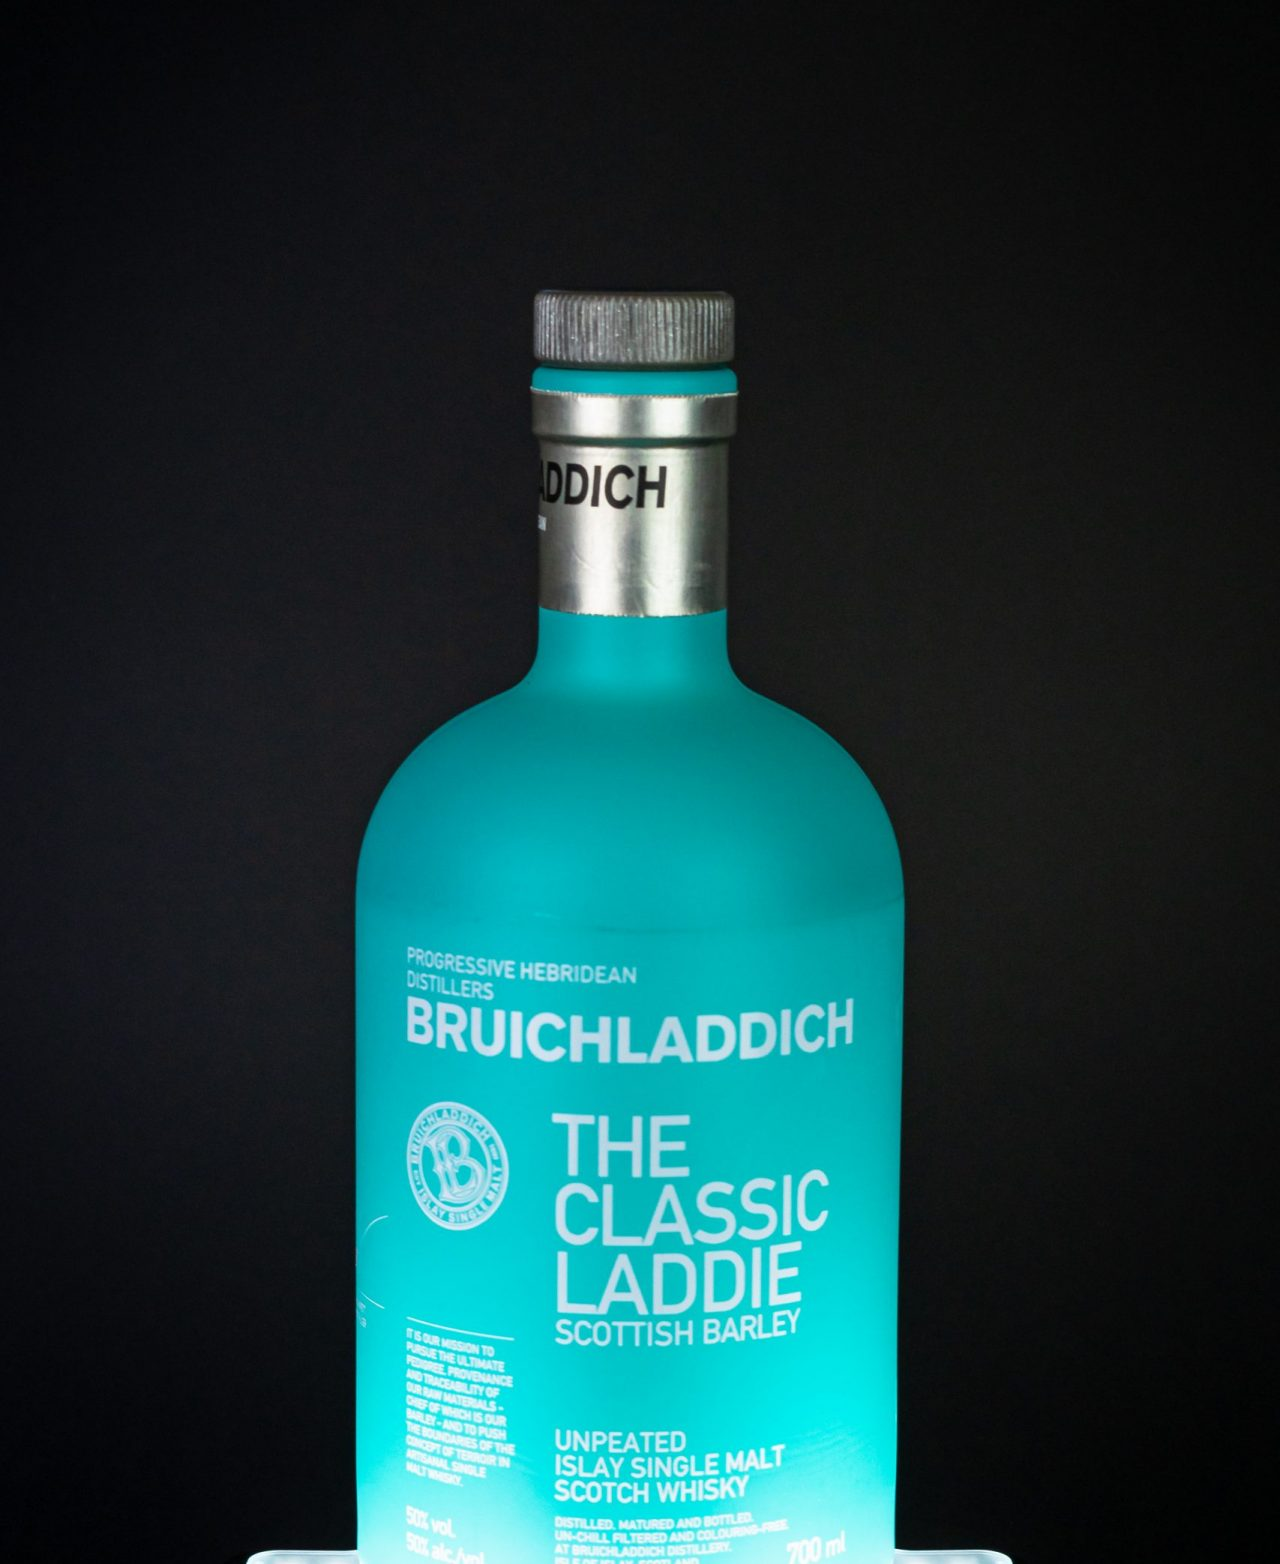 Bruichladdich – The Classic Laddie 5cl